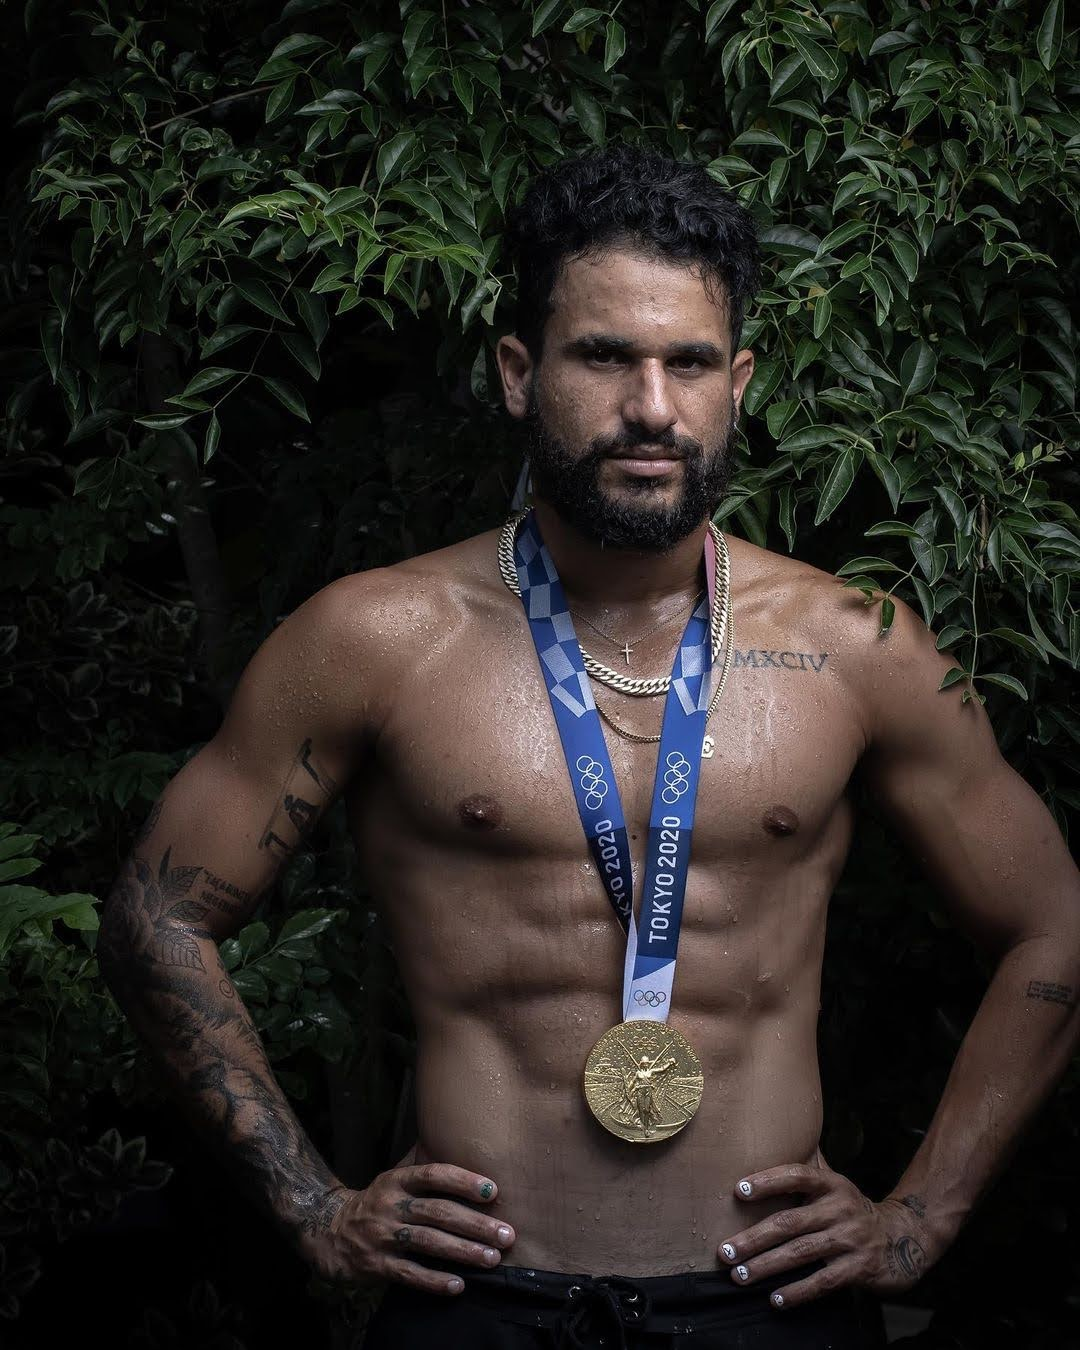 Surfista Italo Ferreira posa sem camisa para ensaio a medalha olímpica. Foto: Jonne Roriz